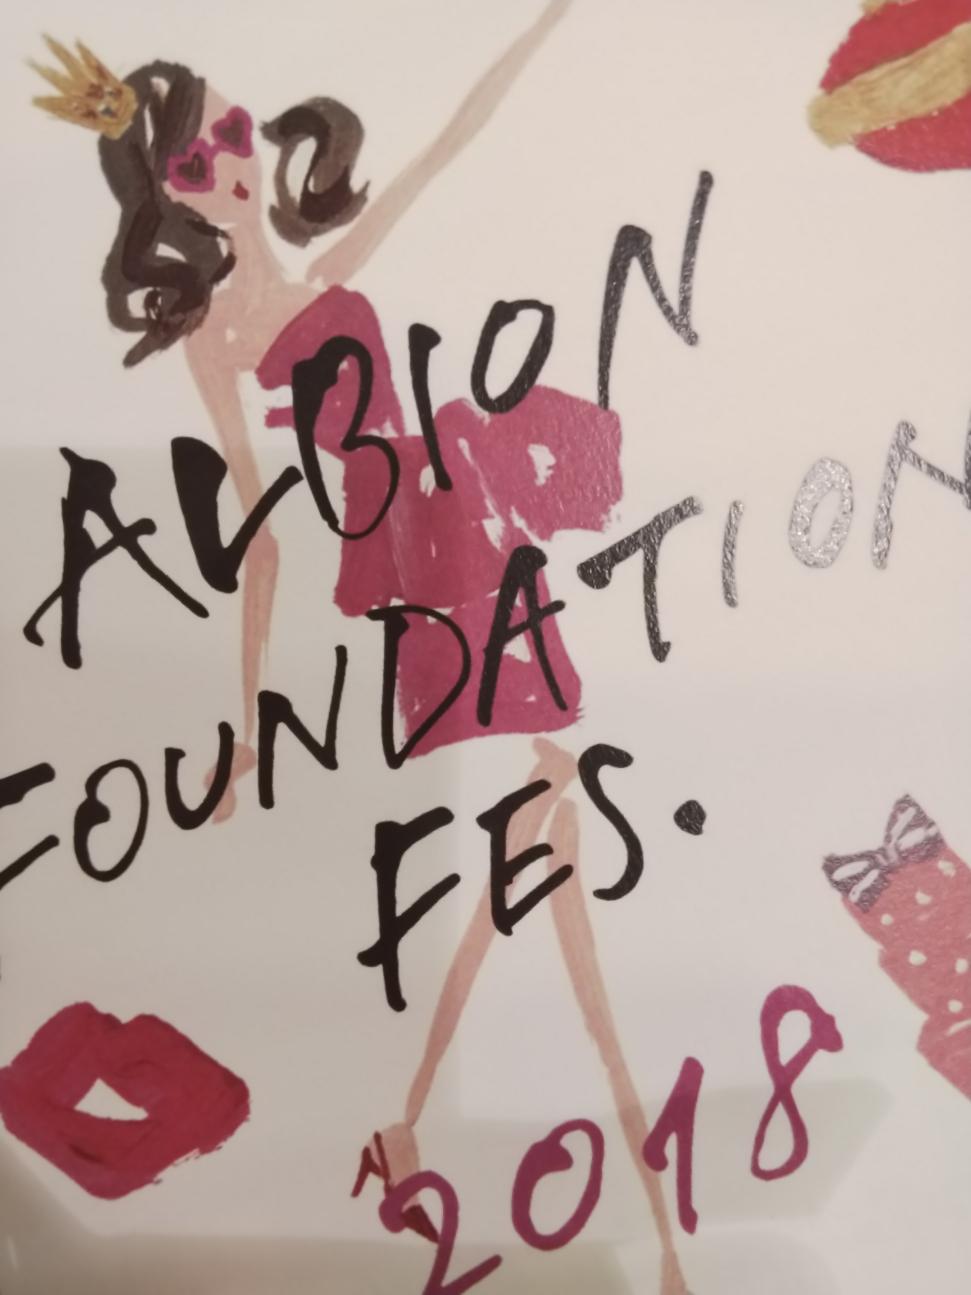 【ALBION】 ファンデーションフェス2018 in名古屋